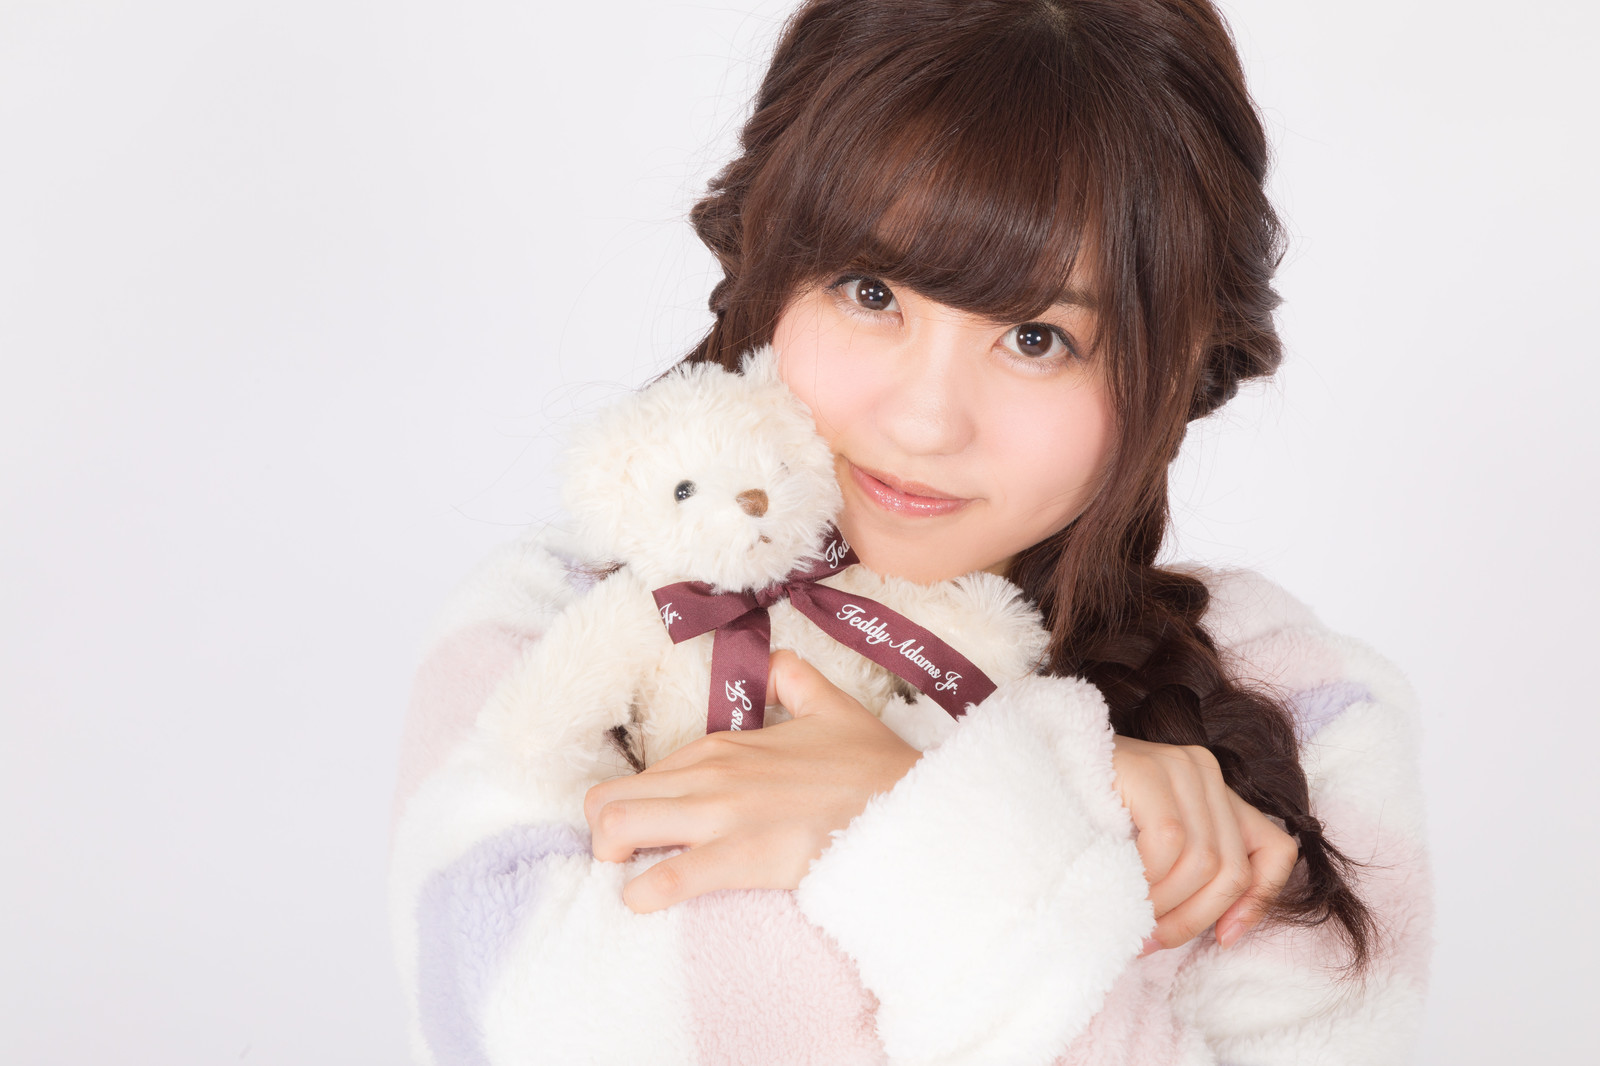 https://www.pakutaso.com/shared/img/thumb/kawamurayukaIMGL0373_TP_V.jpg